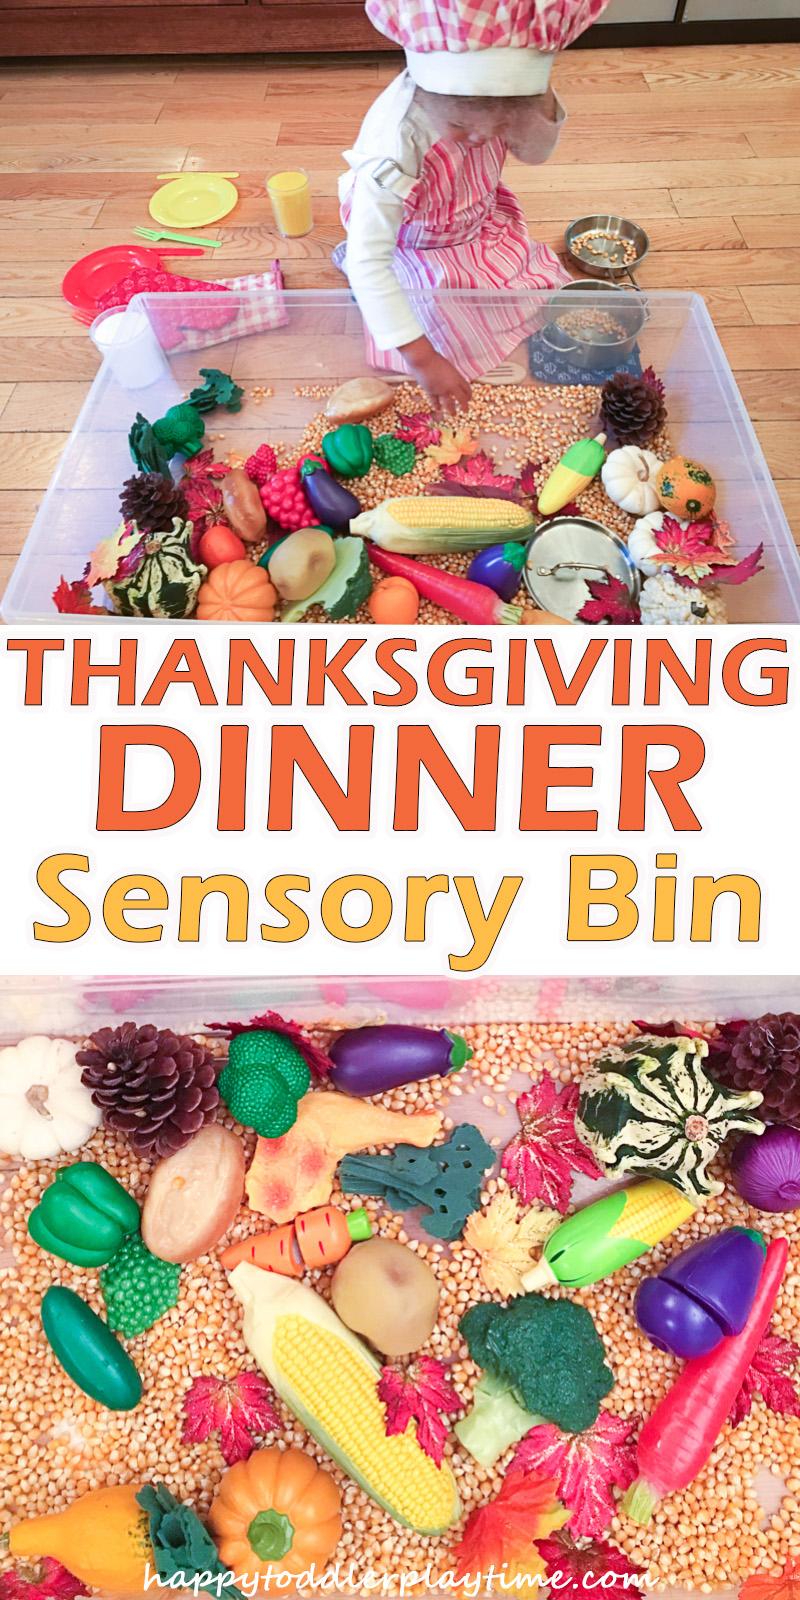 THANKSGIVING DINNER SENSORY BIN pin